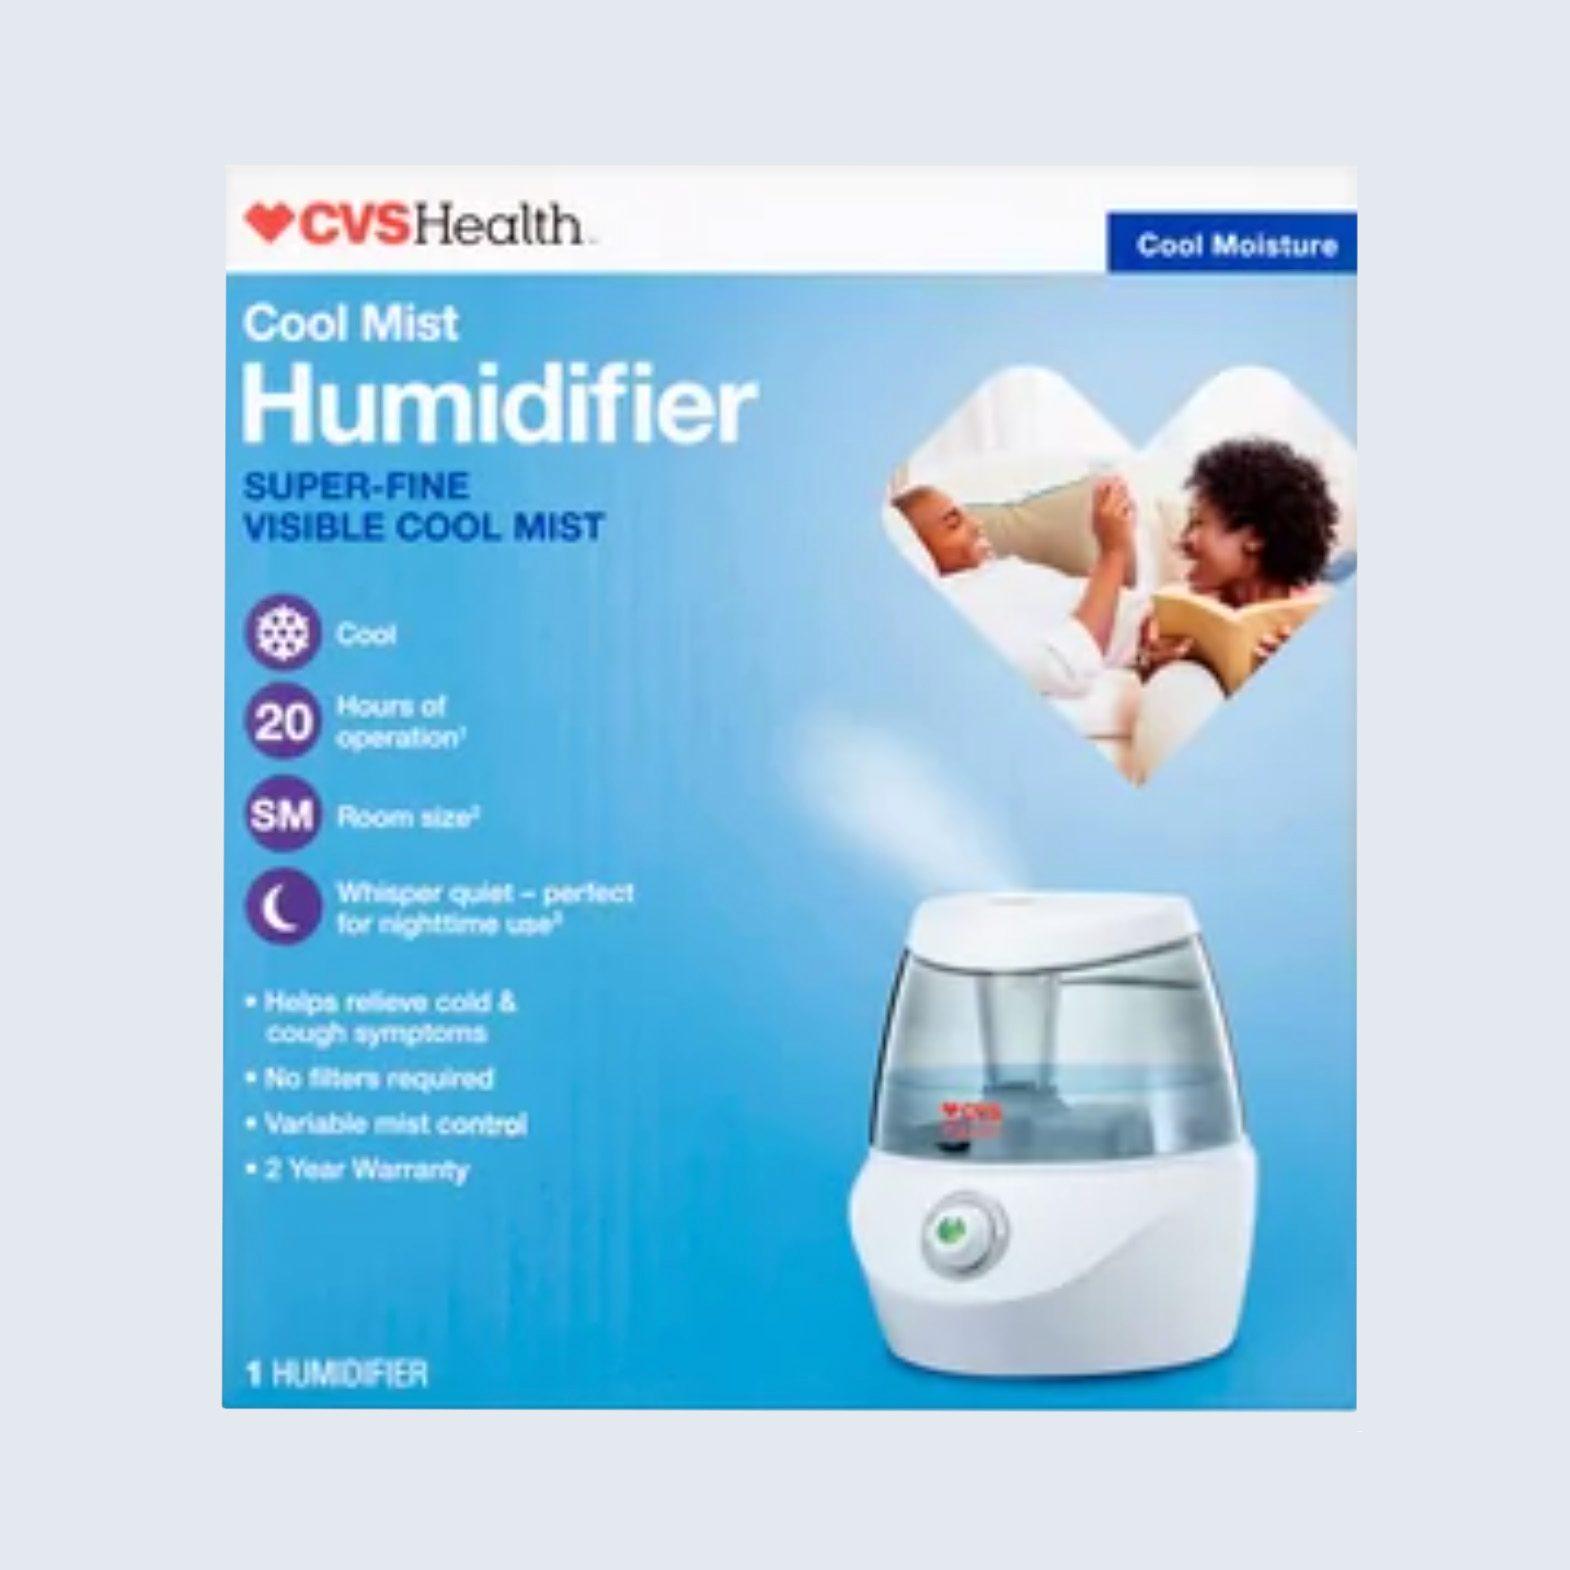 CVS Health Cool Mist Humidifier